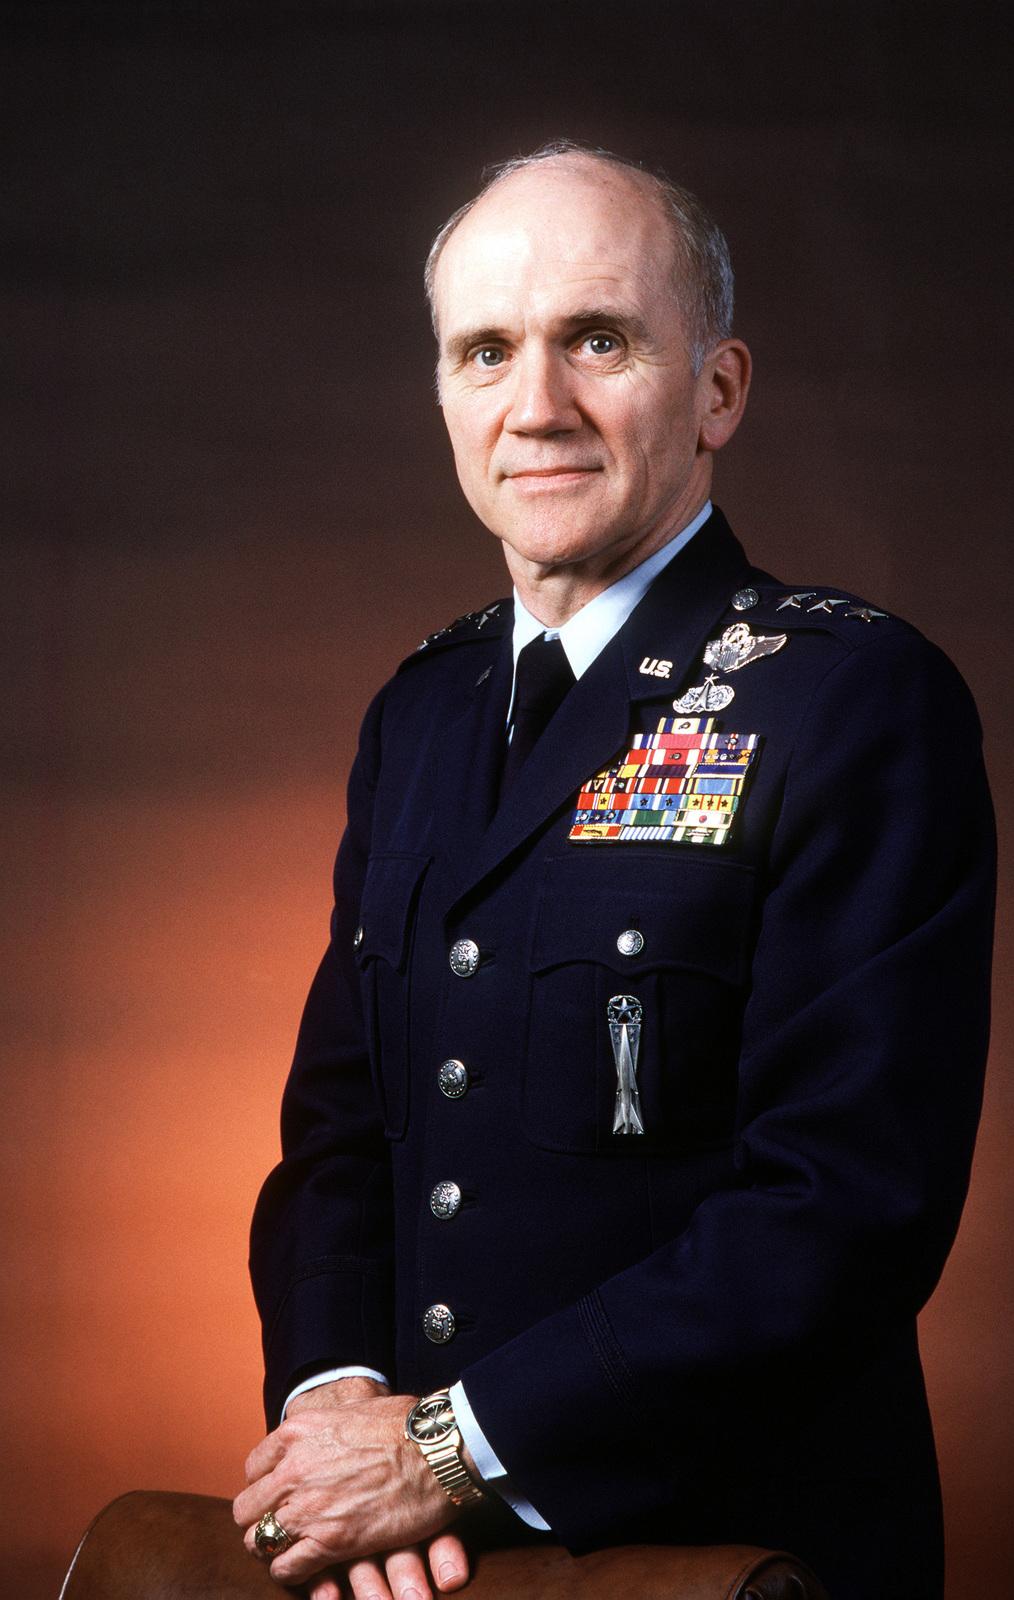 LGEN Thomas H. McMullen, USAF (uncovered)